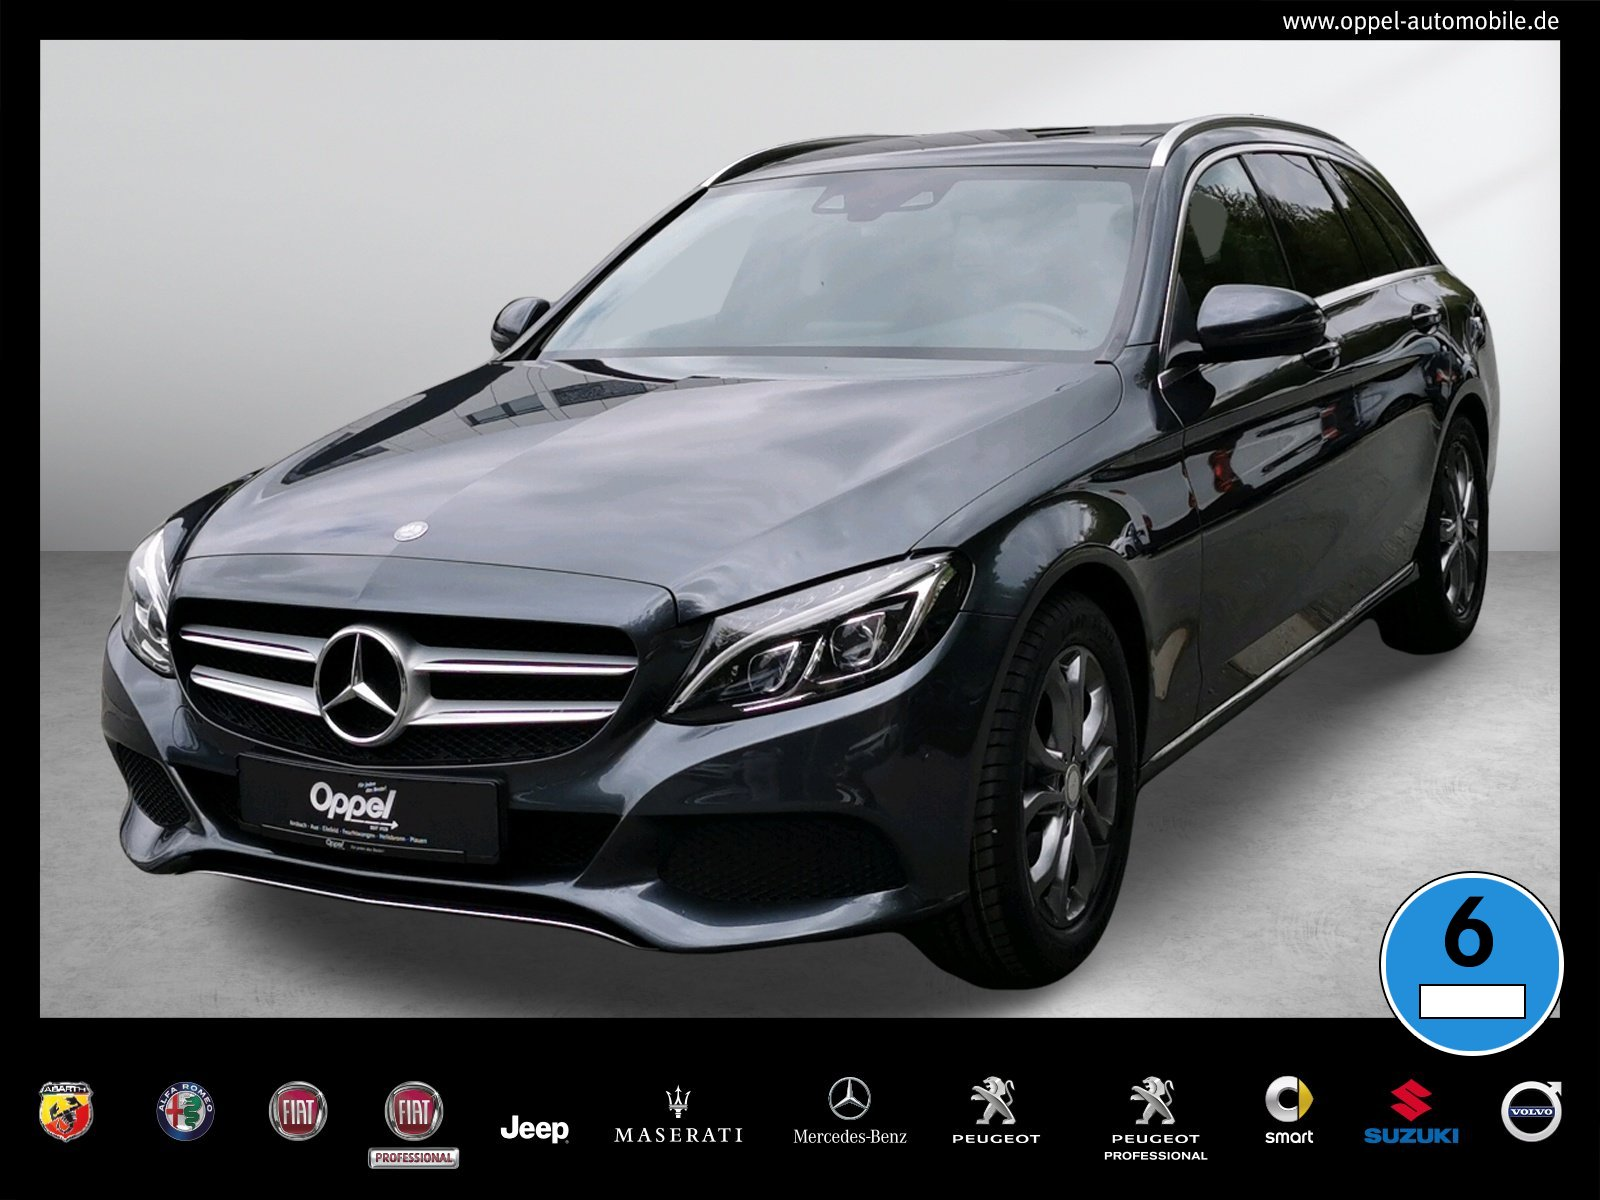 Mercedes-Benz C 200 T Avantgarde NAVI+PANO.-DACH+LED+SITZ-HZG+, Jahr 2016, Benzin